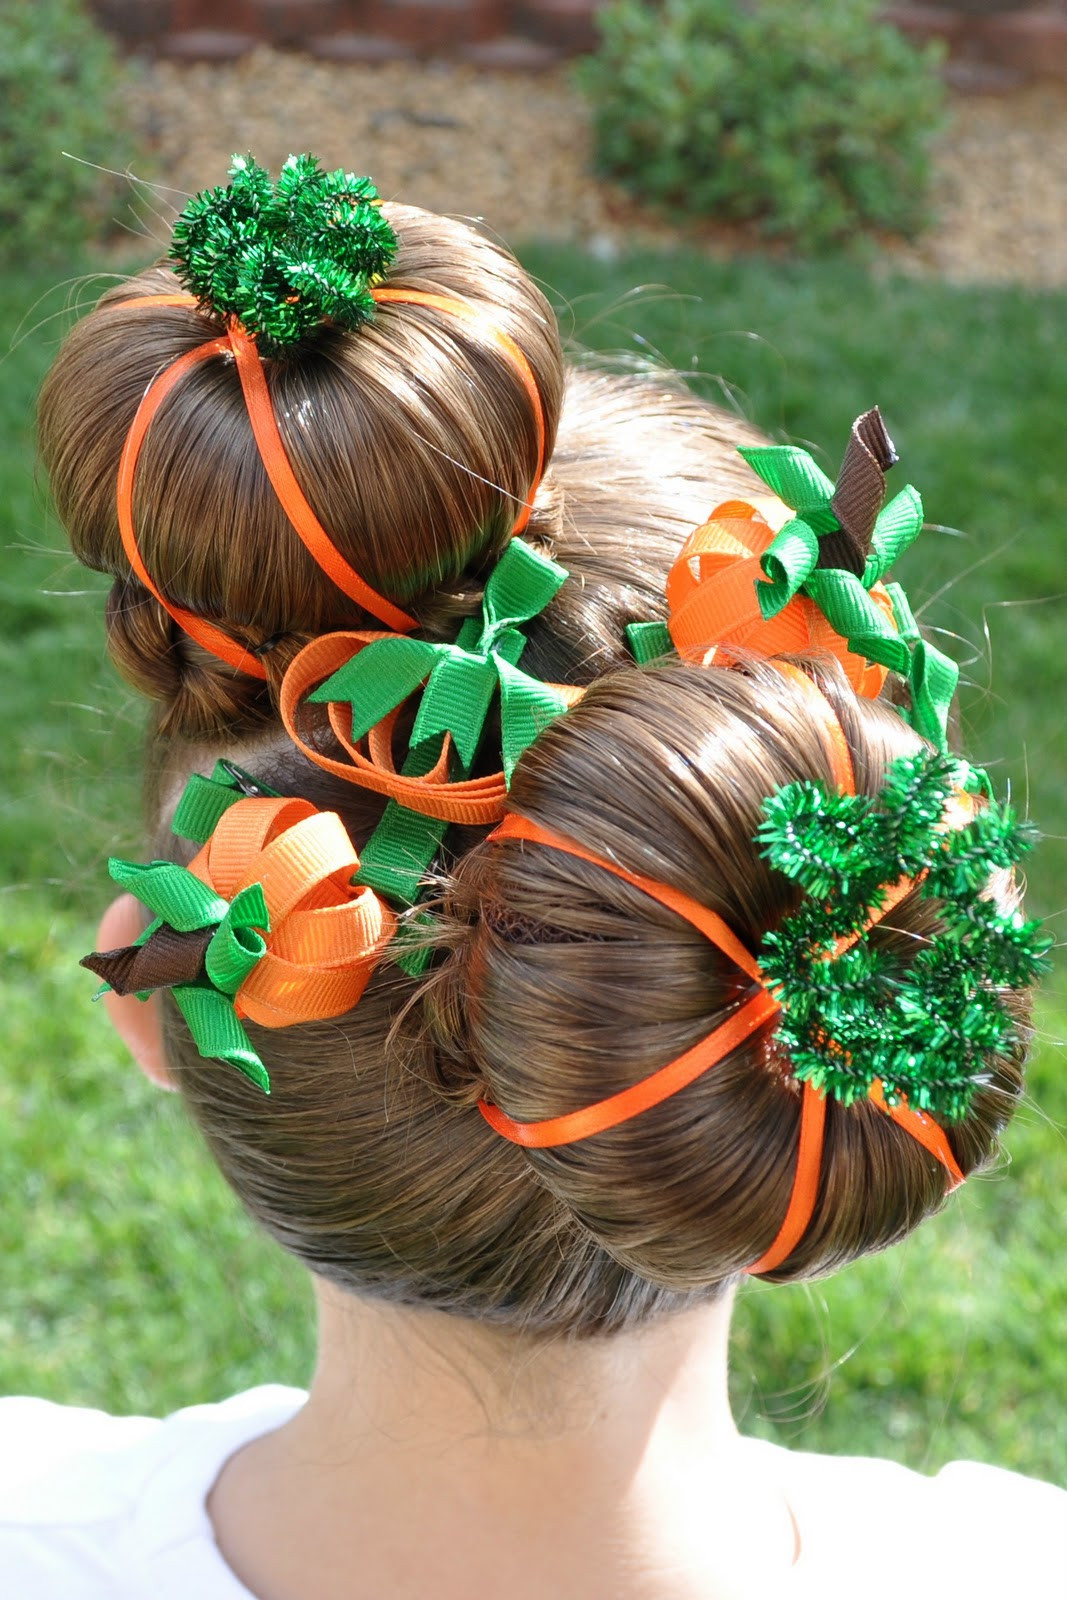 Best ideas about Halloween Hairstyles . Save or Pin Princess Piggies Halloween Hairdos Pumpkin Patch Now.